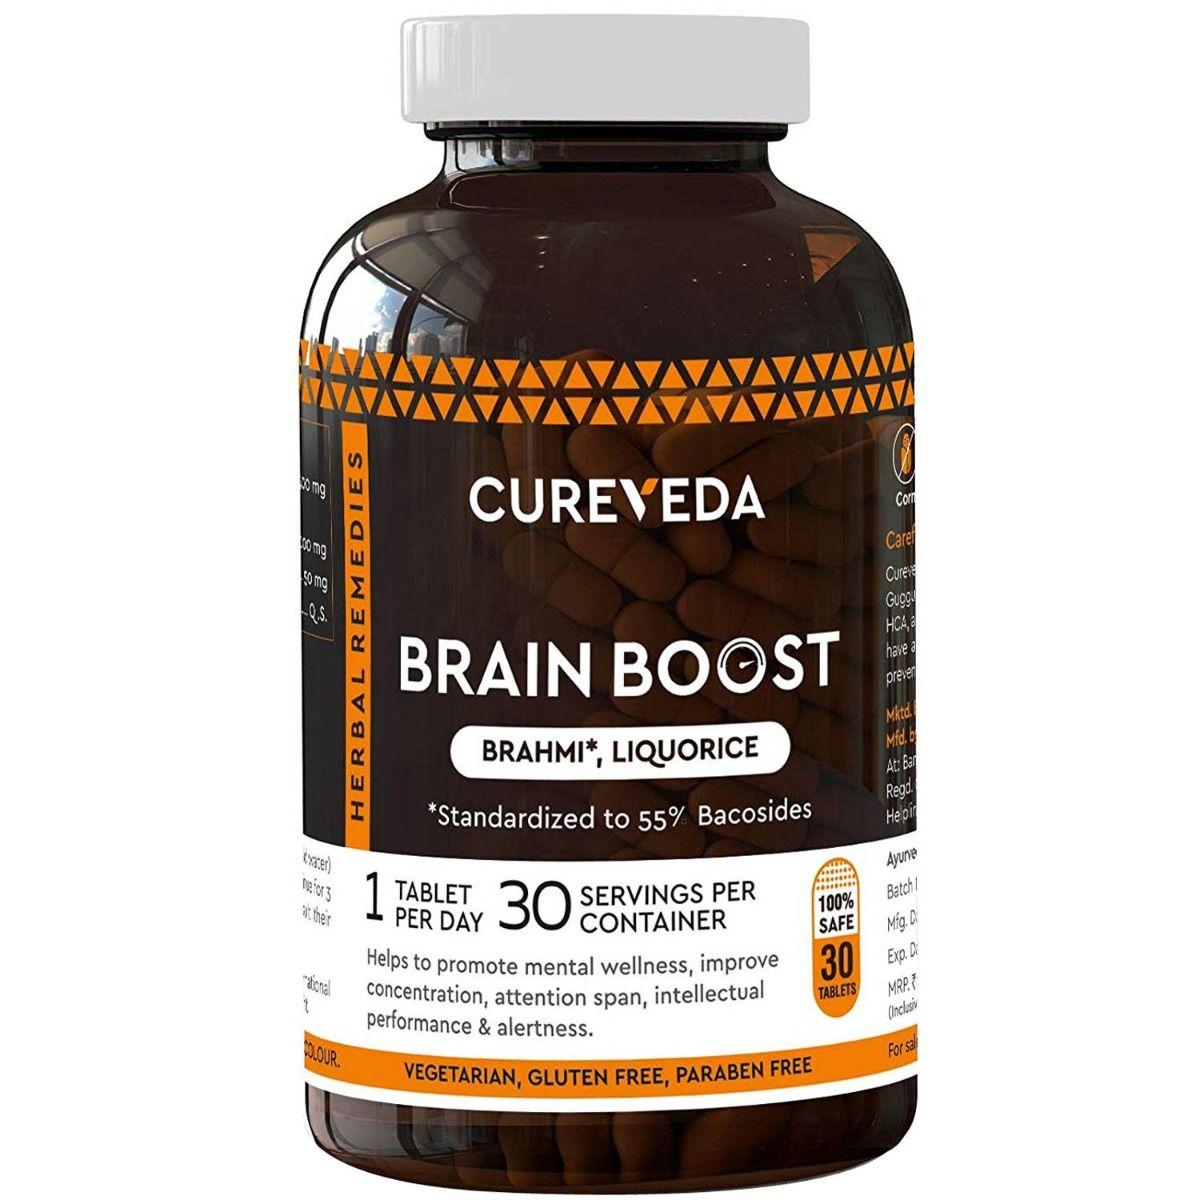 Cureveda Brain Boost, 30 Tablets